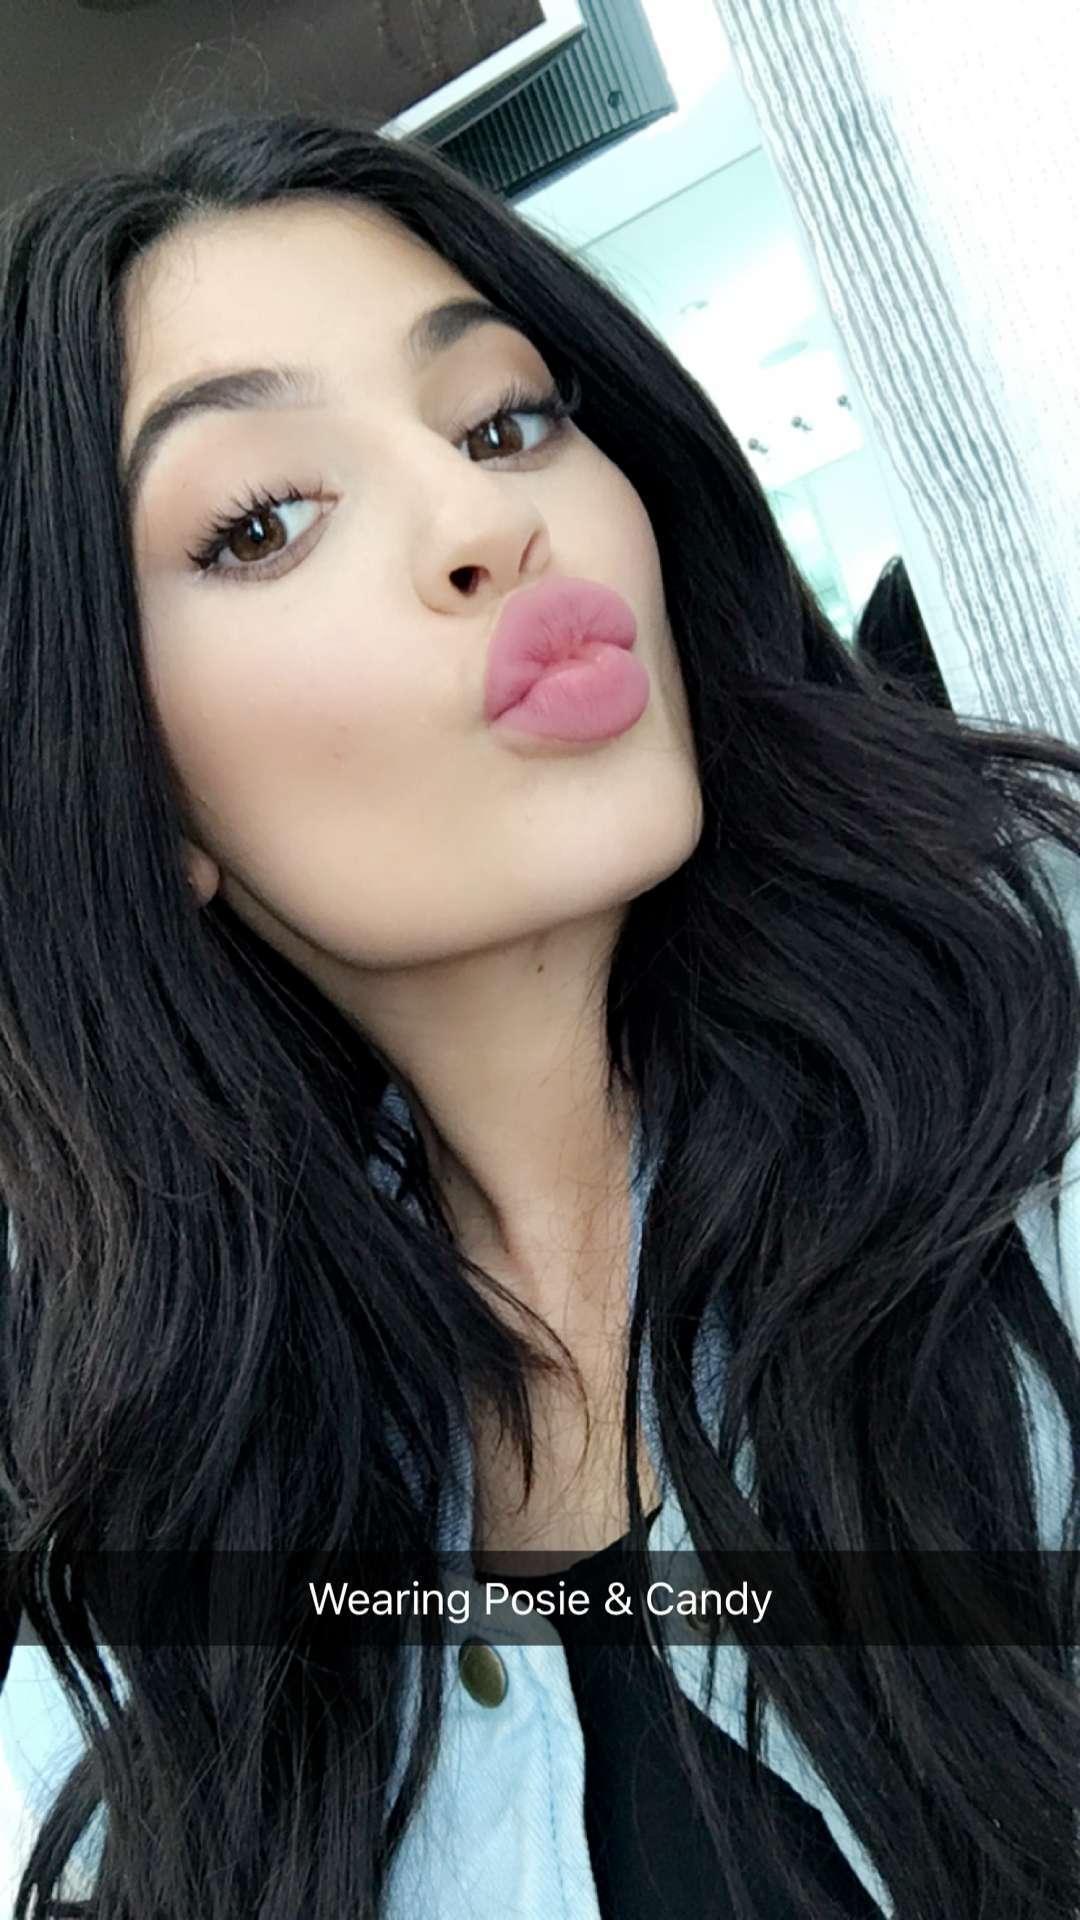 Kylie Jenner Iphone Wallpaper